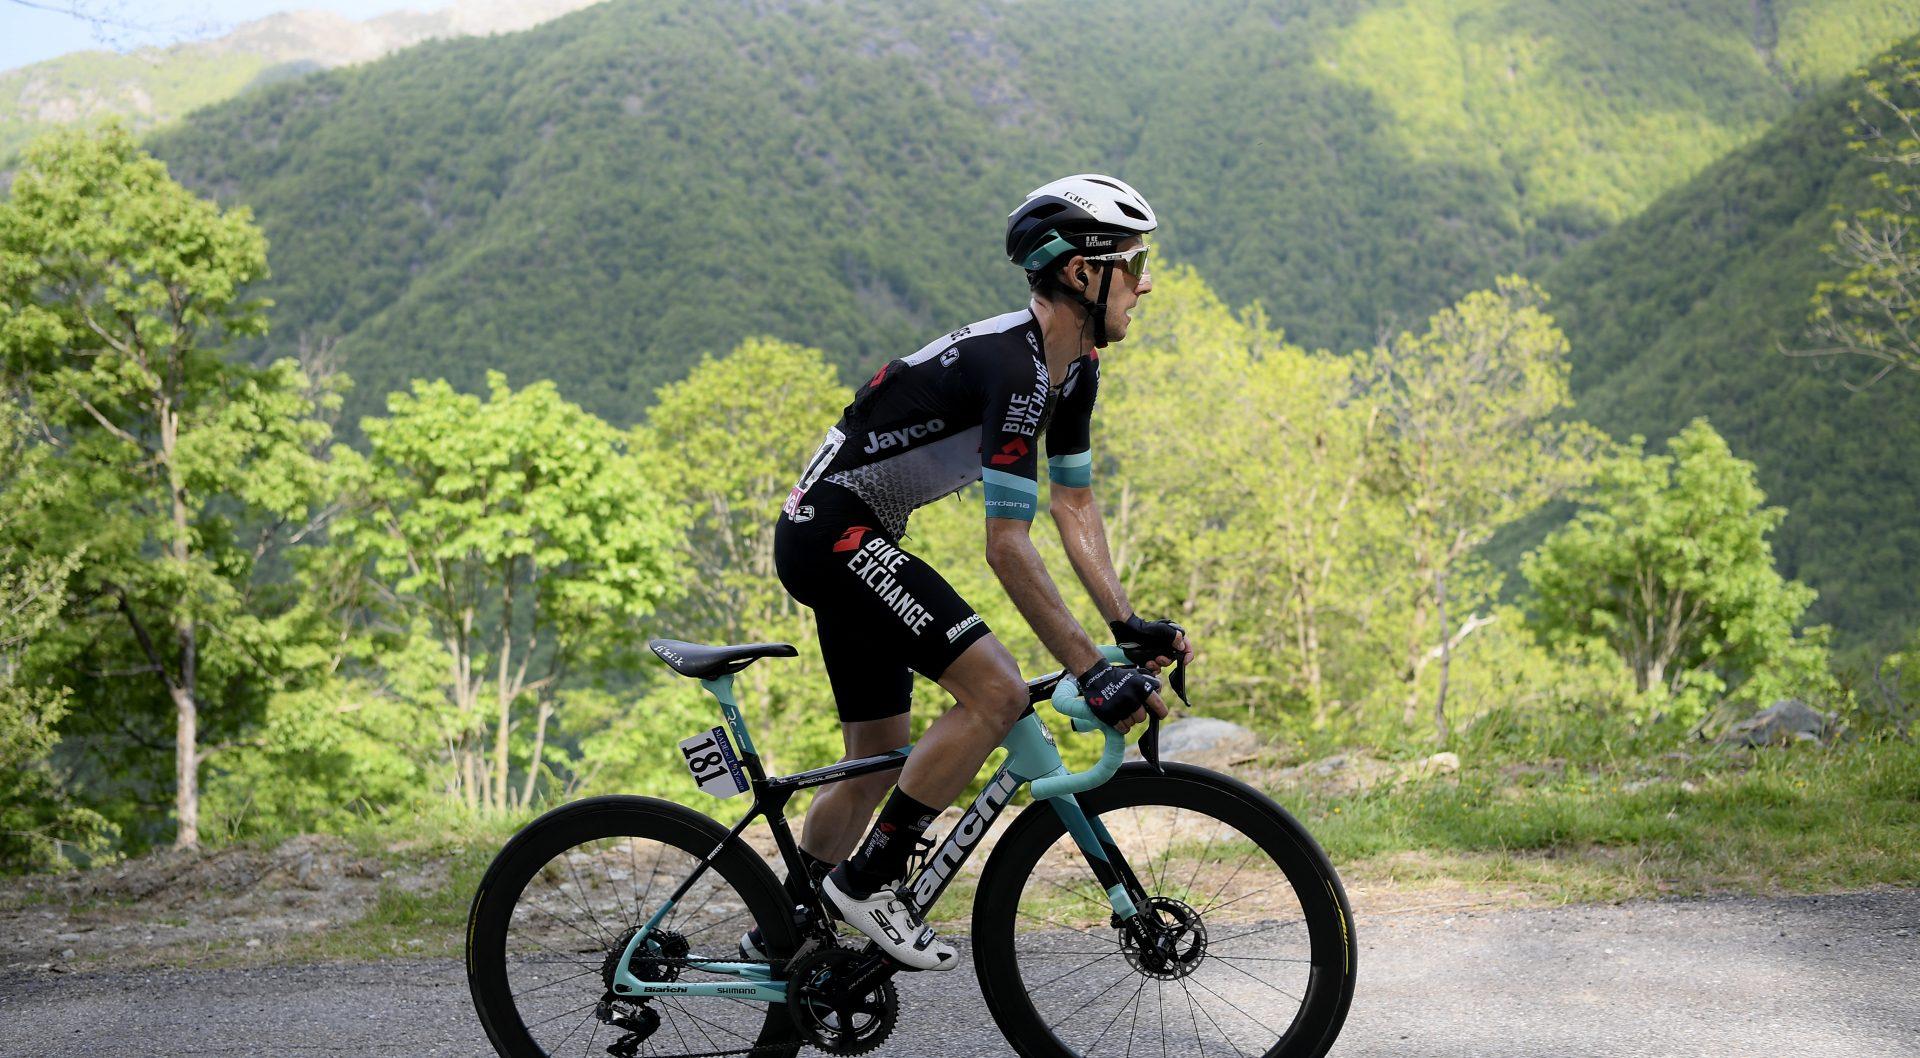 Giro d'Italia 2021 - 104th Edition - 19th stage Abbiategrasso - Alpe di Mera 166 km - 28/05/2021 - Simon Yates (GBR - Team Bikeexchange) - photo POOL Fabio Ferrari/BettiniPhoto©2021